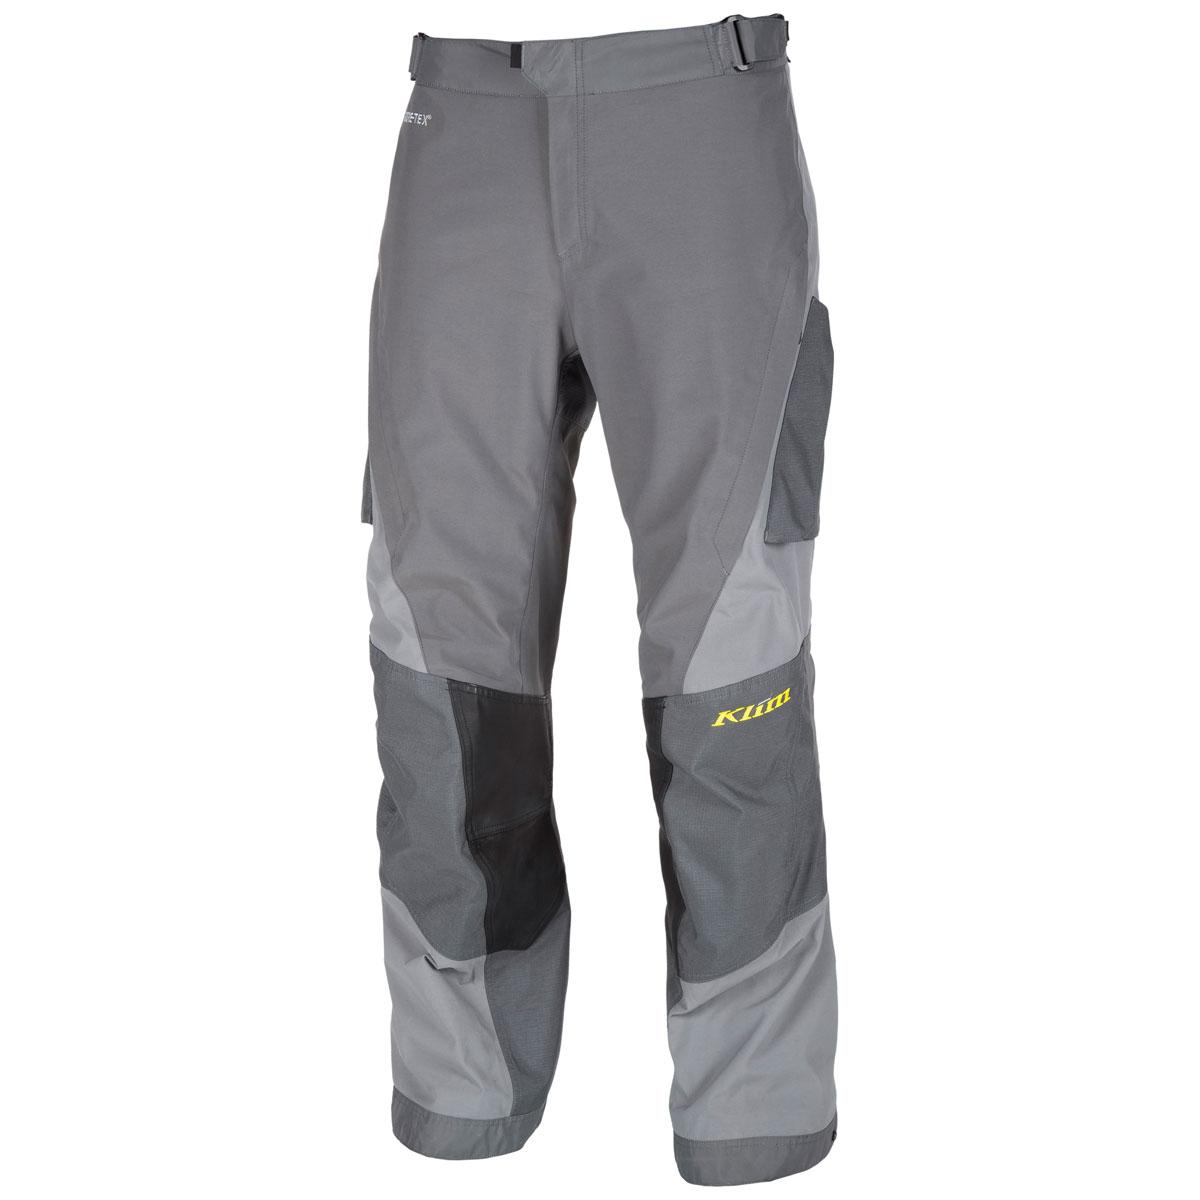 Klim Carlsbad Gray Riding Pants